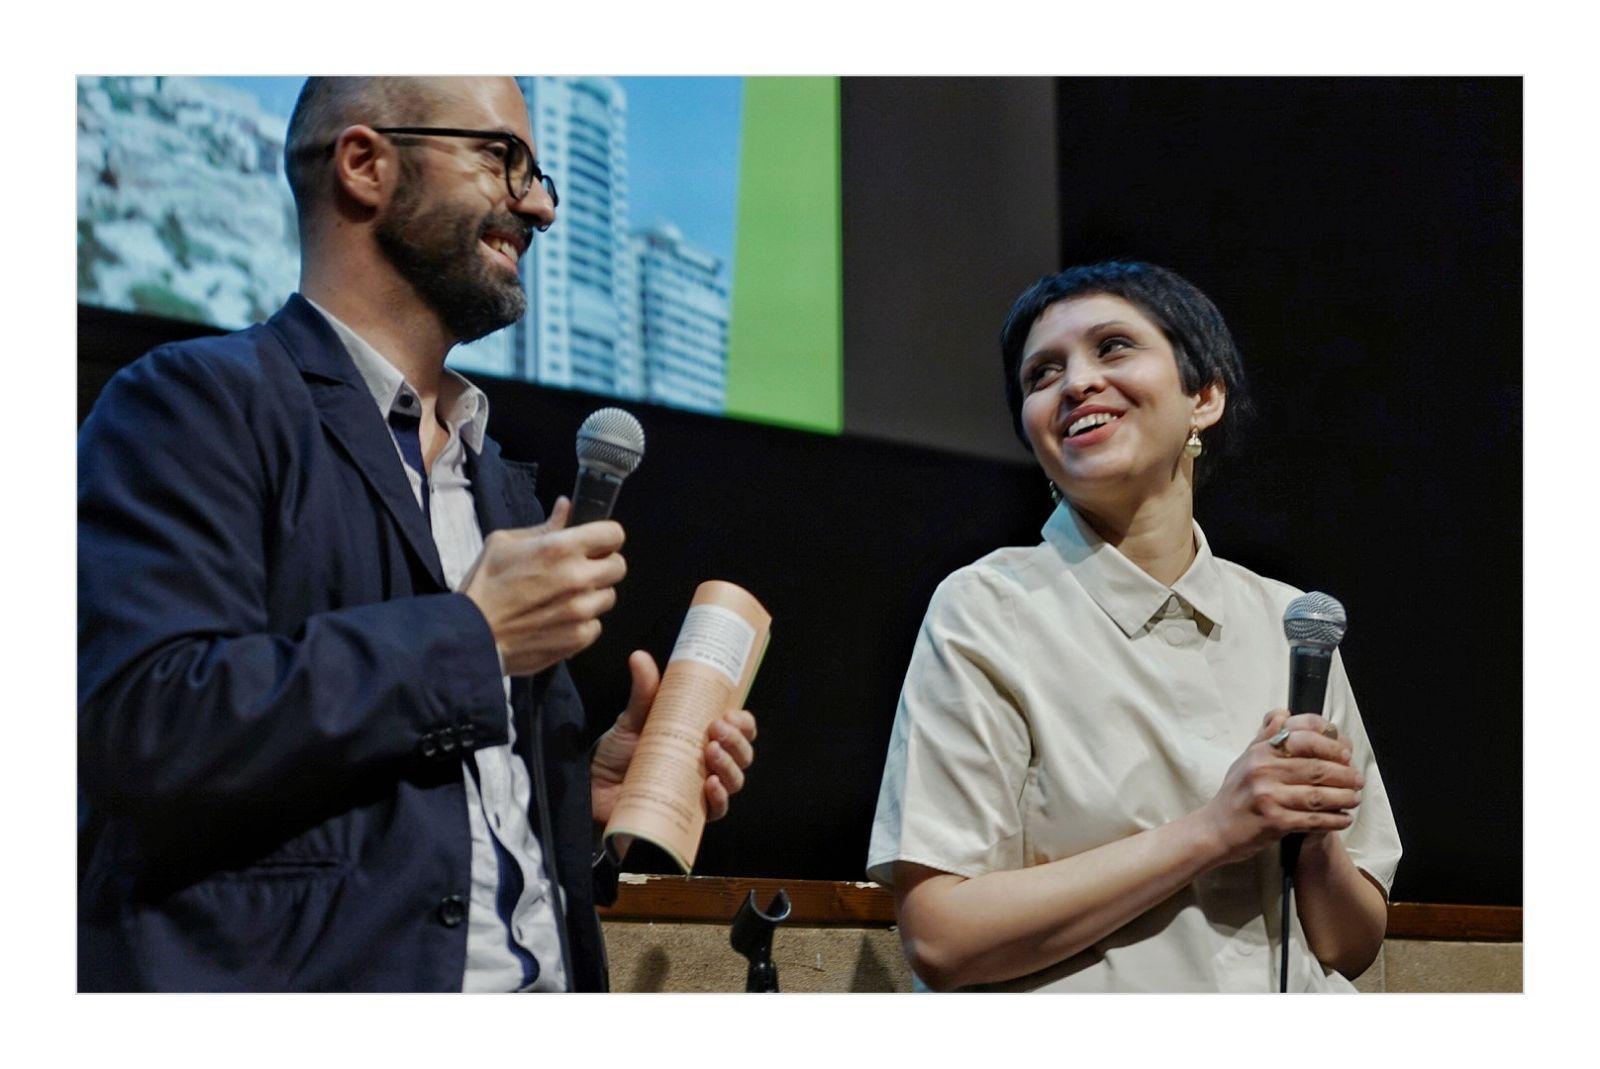 'Stronger than a bullet' director Maryam Ebrahimi